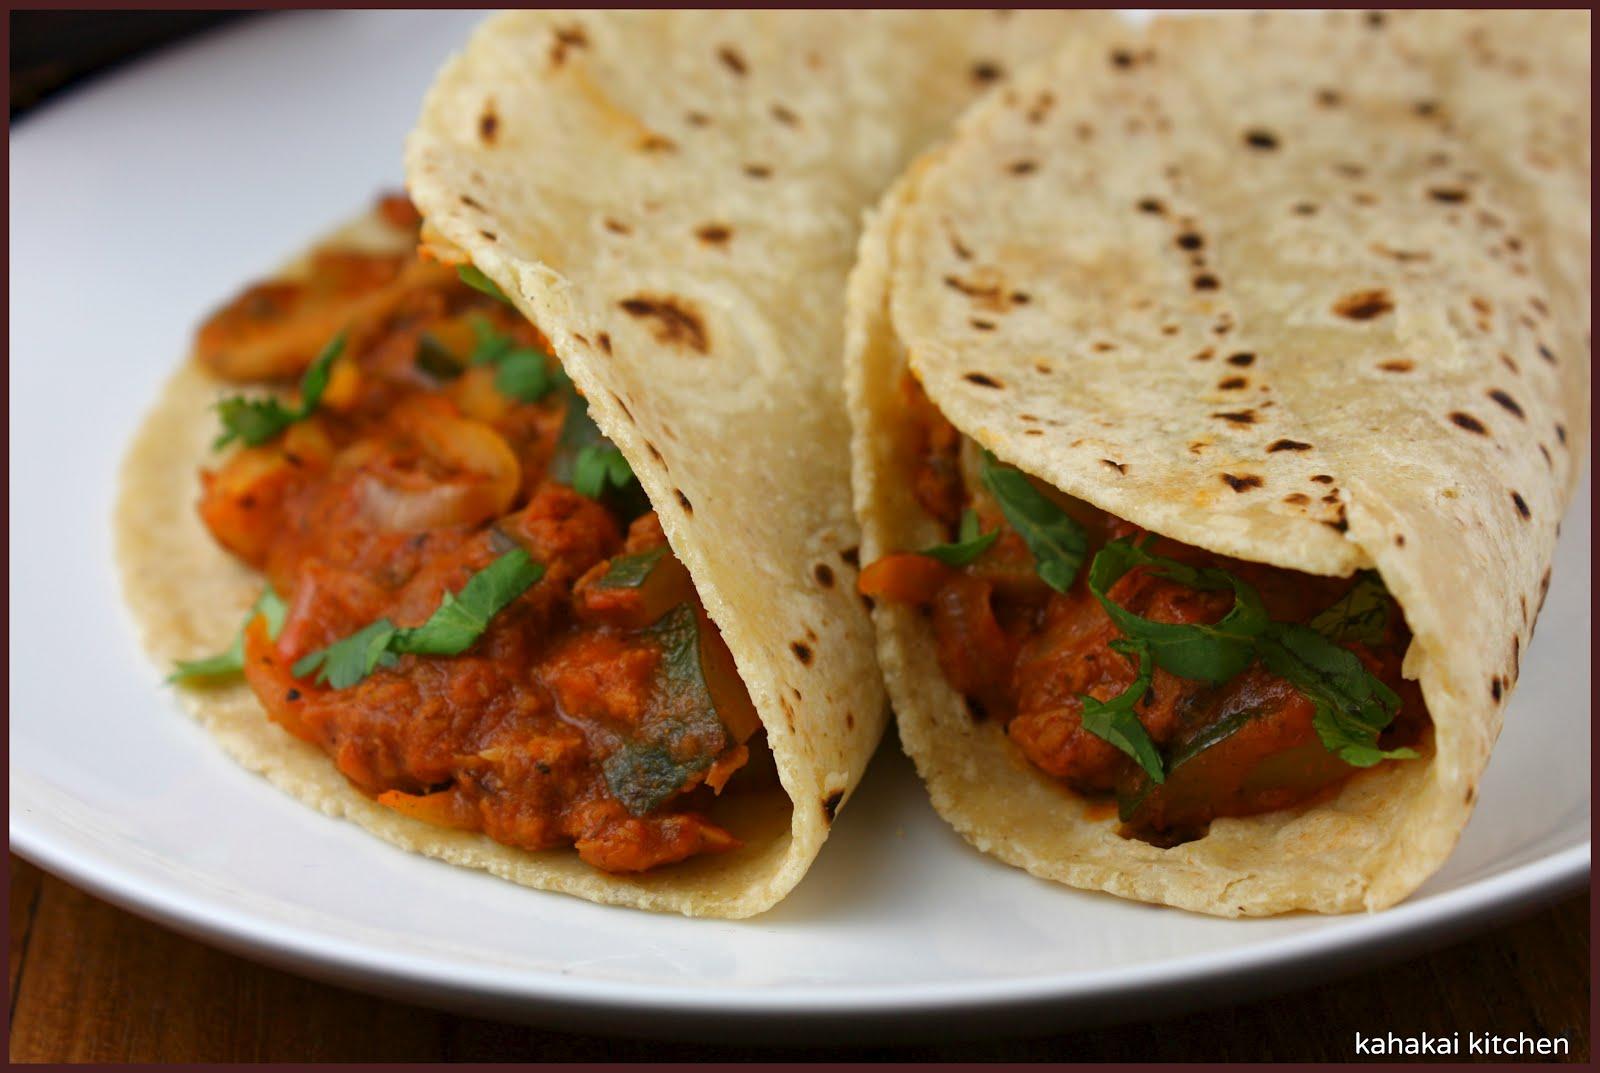 Kahakai Kitchen: Zucchini-Mushroom Tacos with (SoyRizo ...